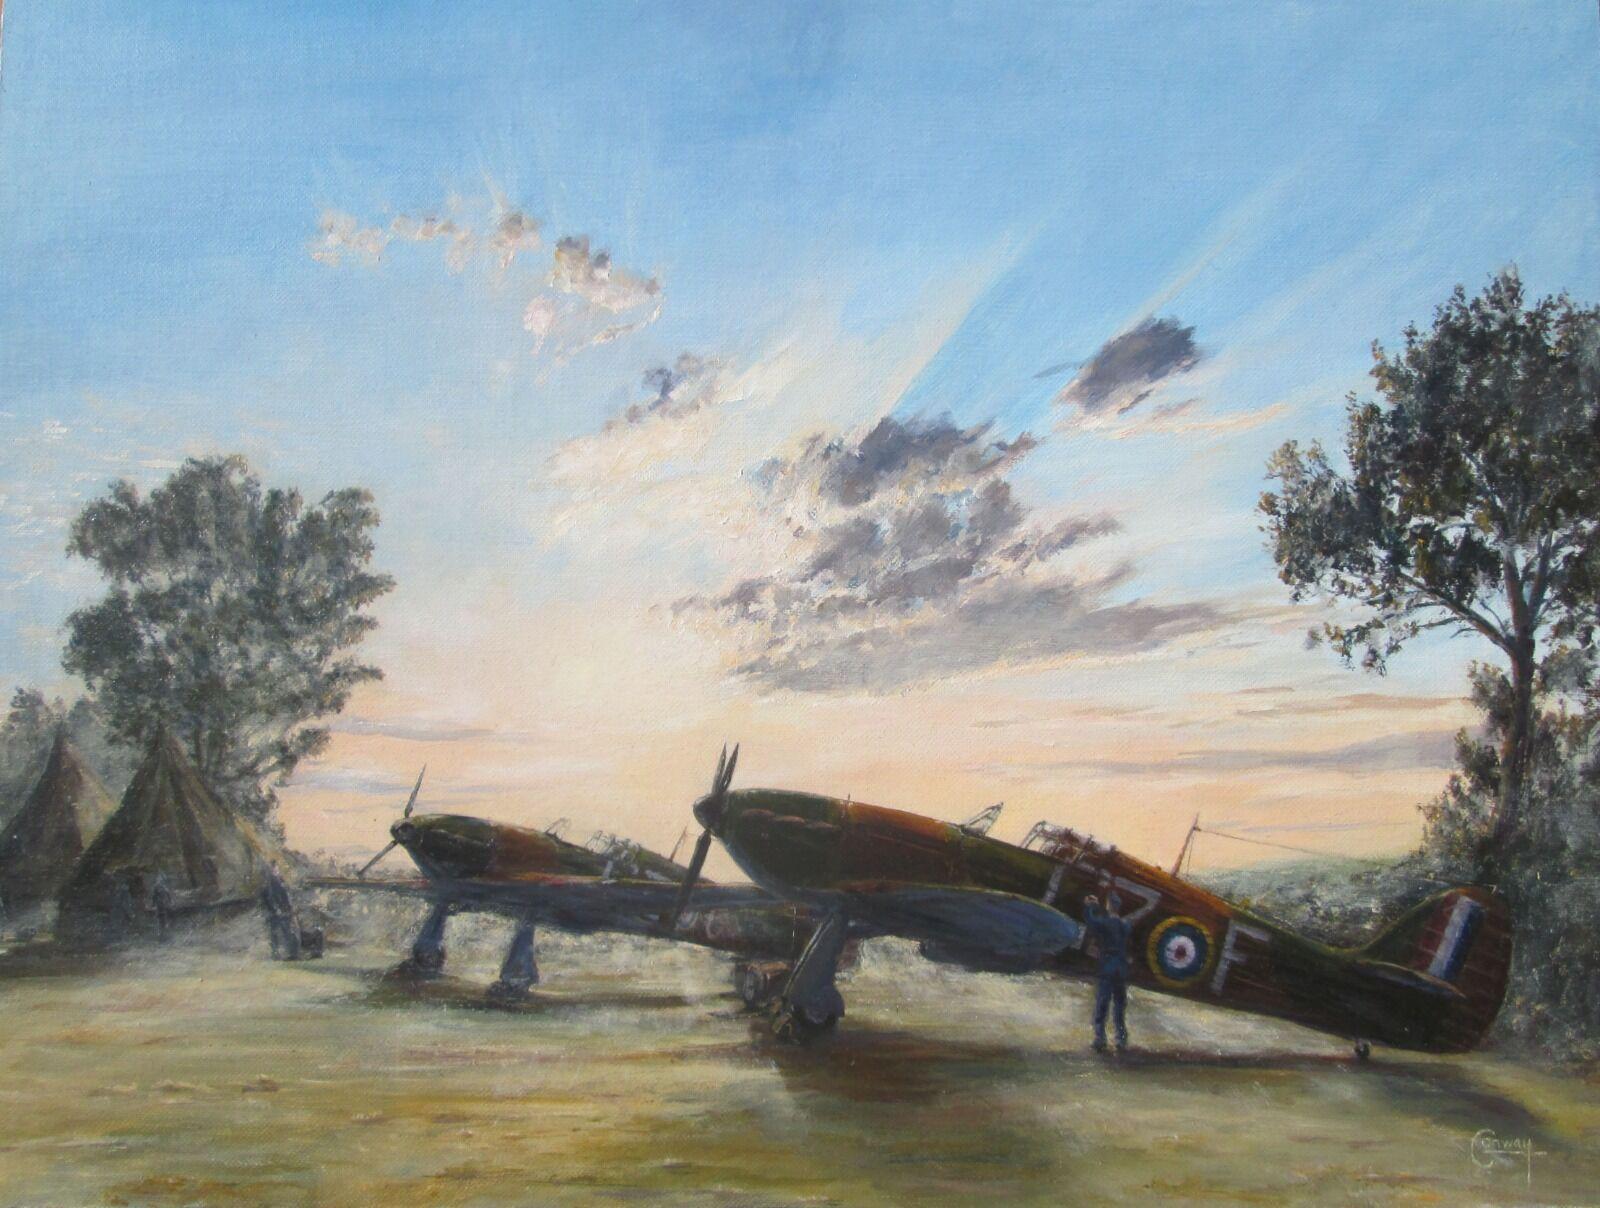 'Dawn Readiness' - Hurricanes of No. 32 Squadron